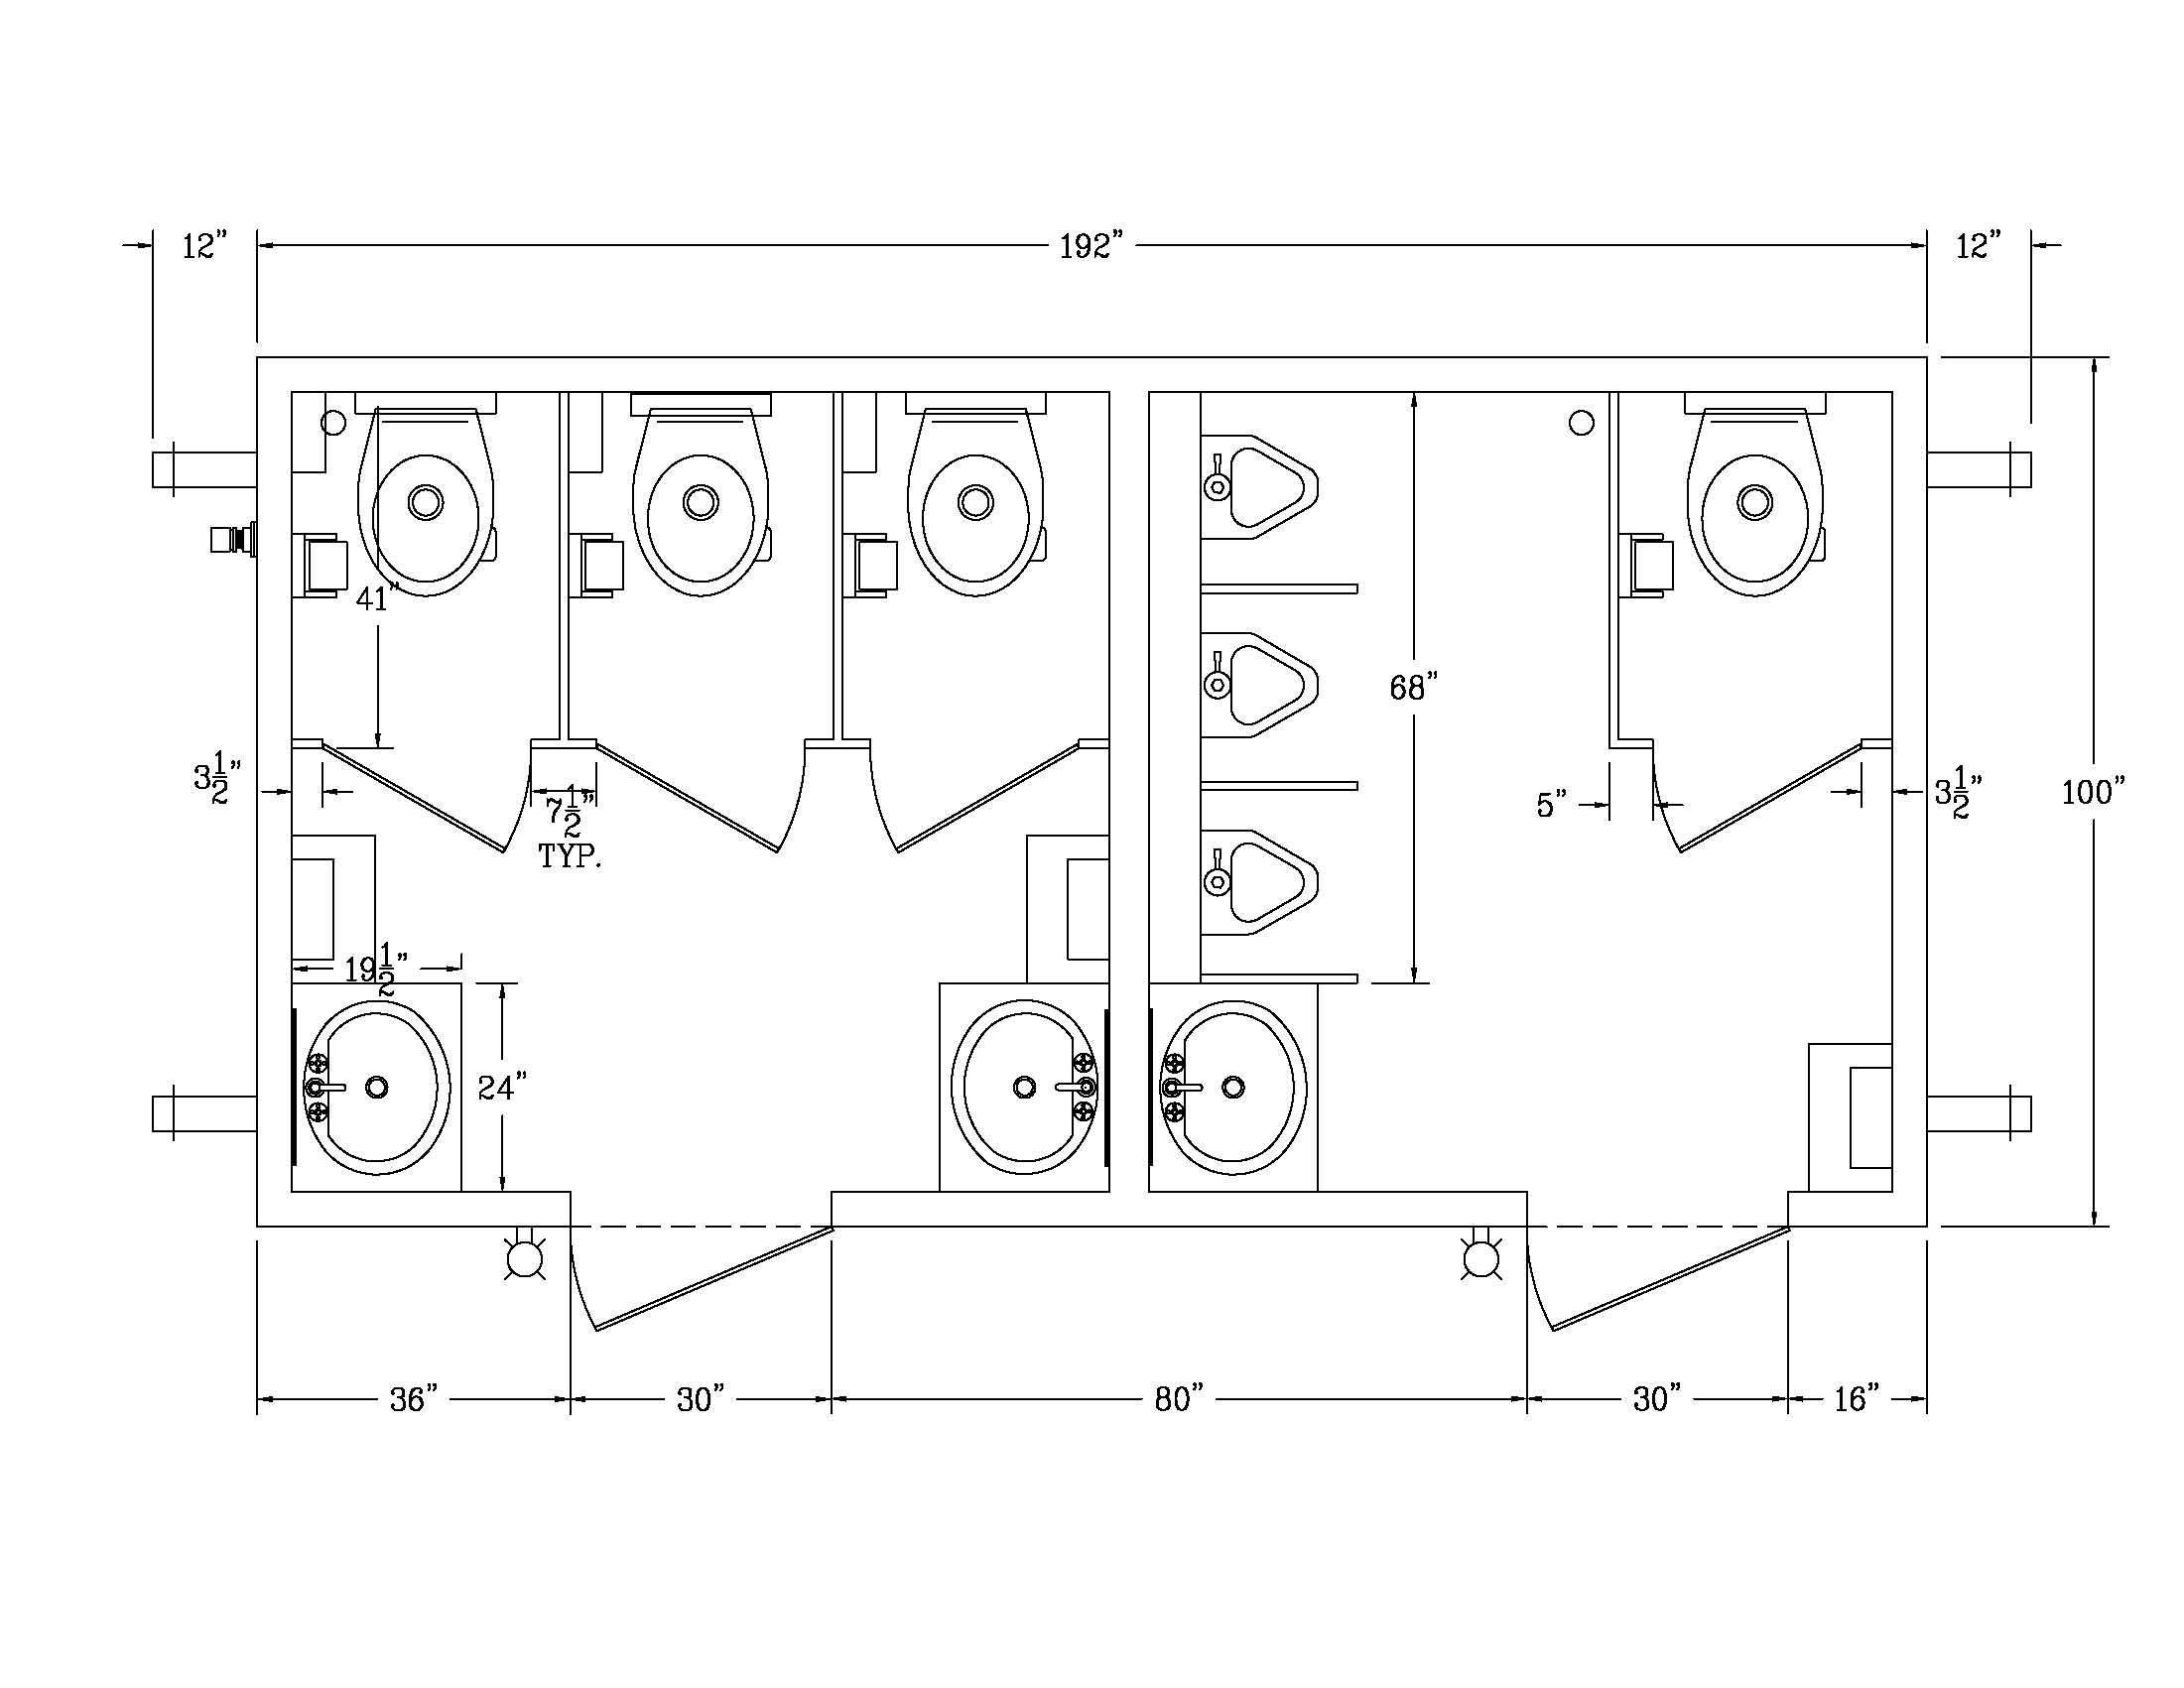 hight resolution of charming bathroom stall dimensions part 1 public bathroom stall dimensions